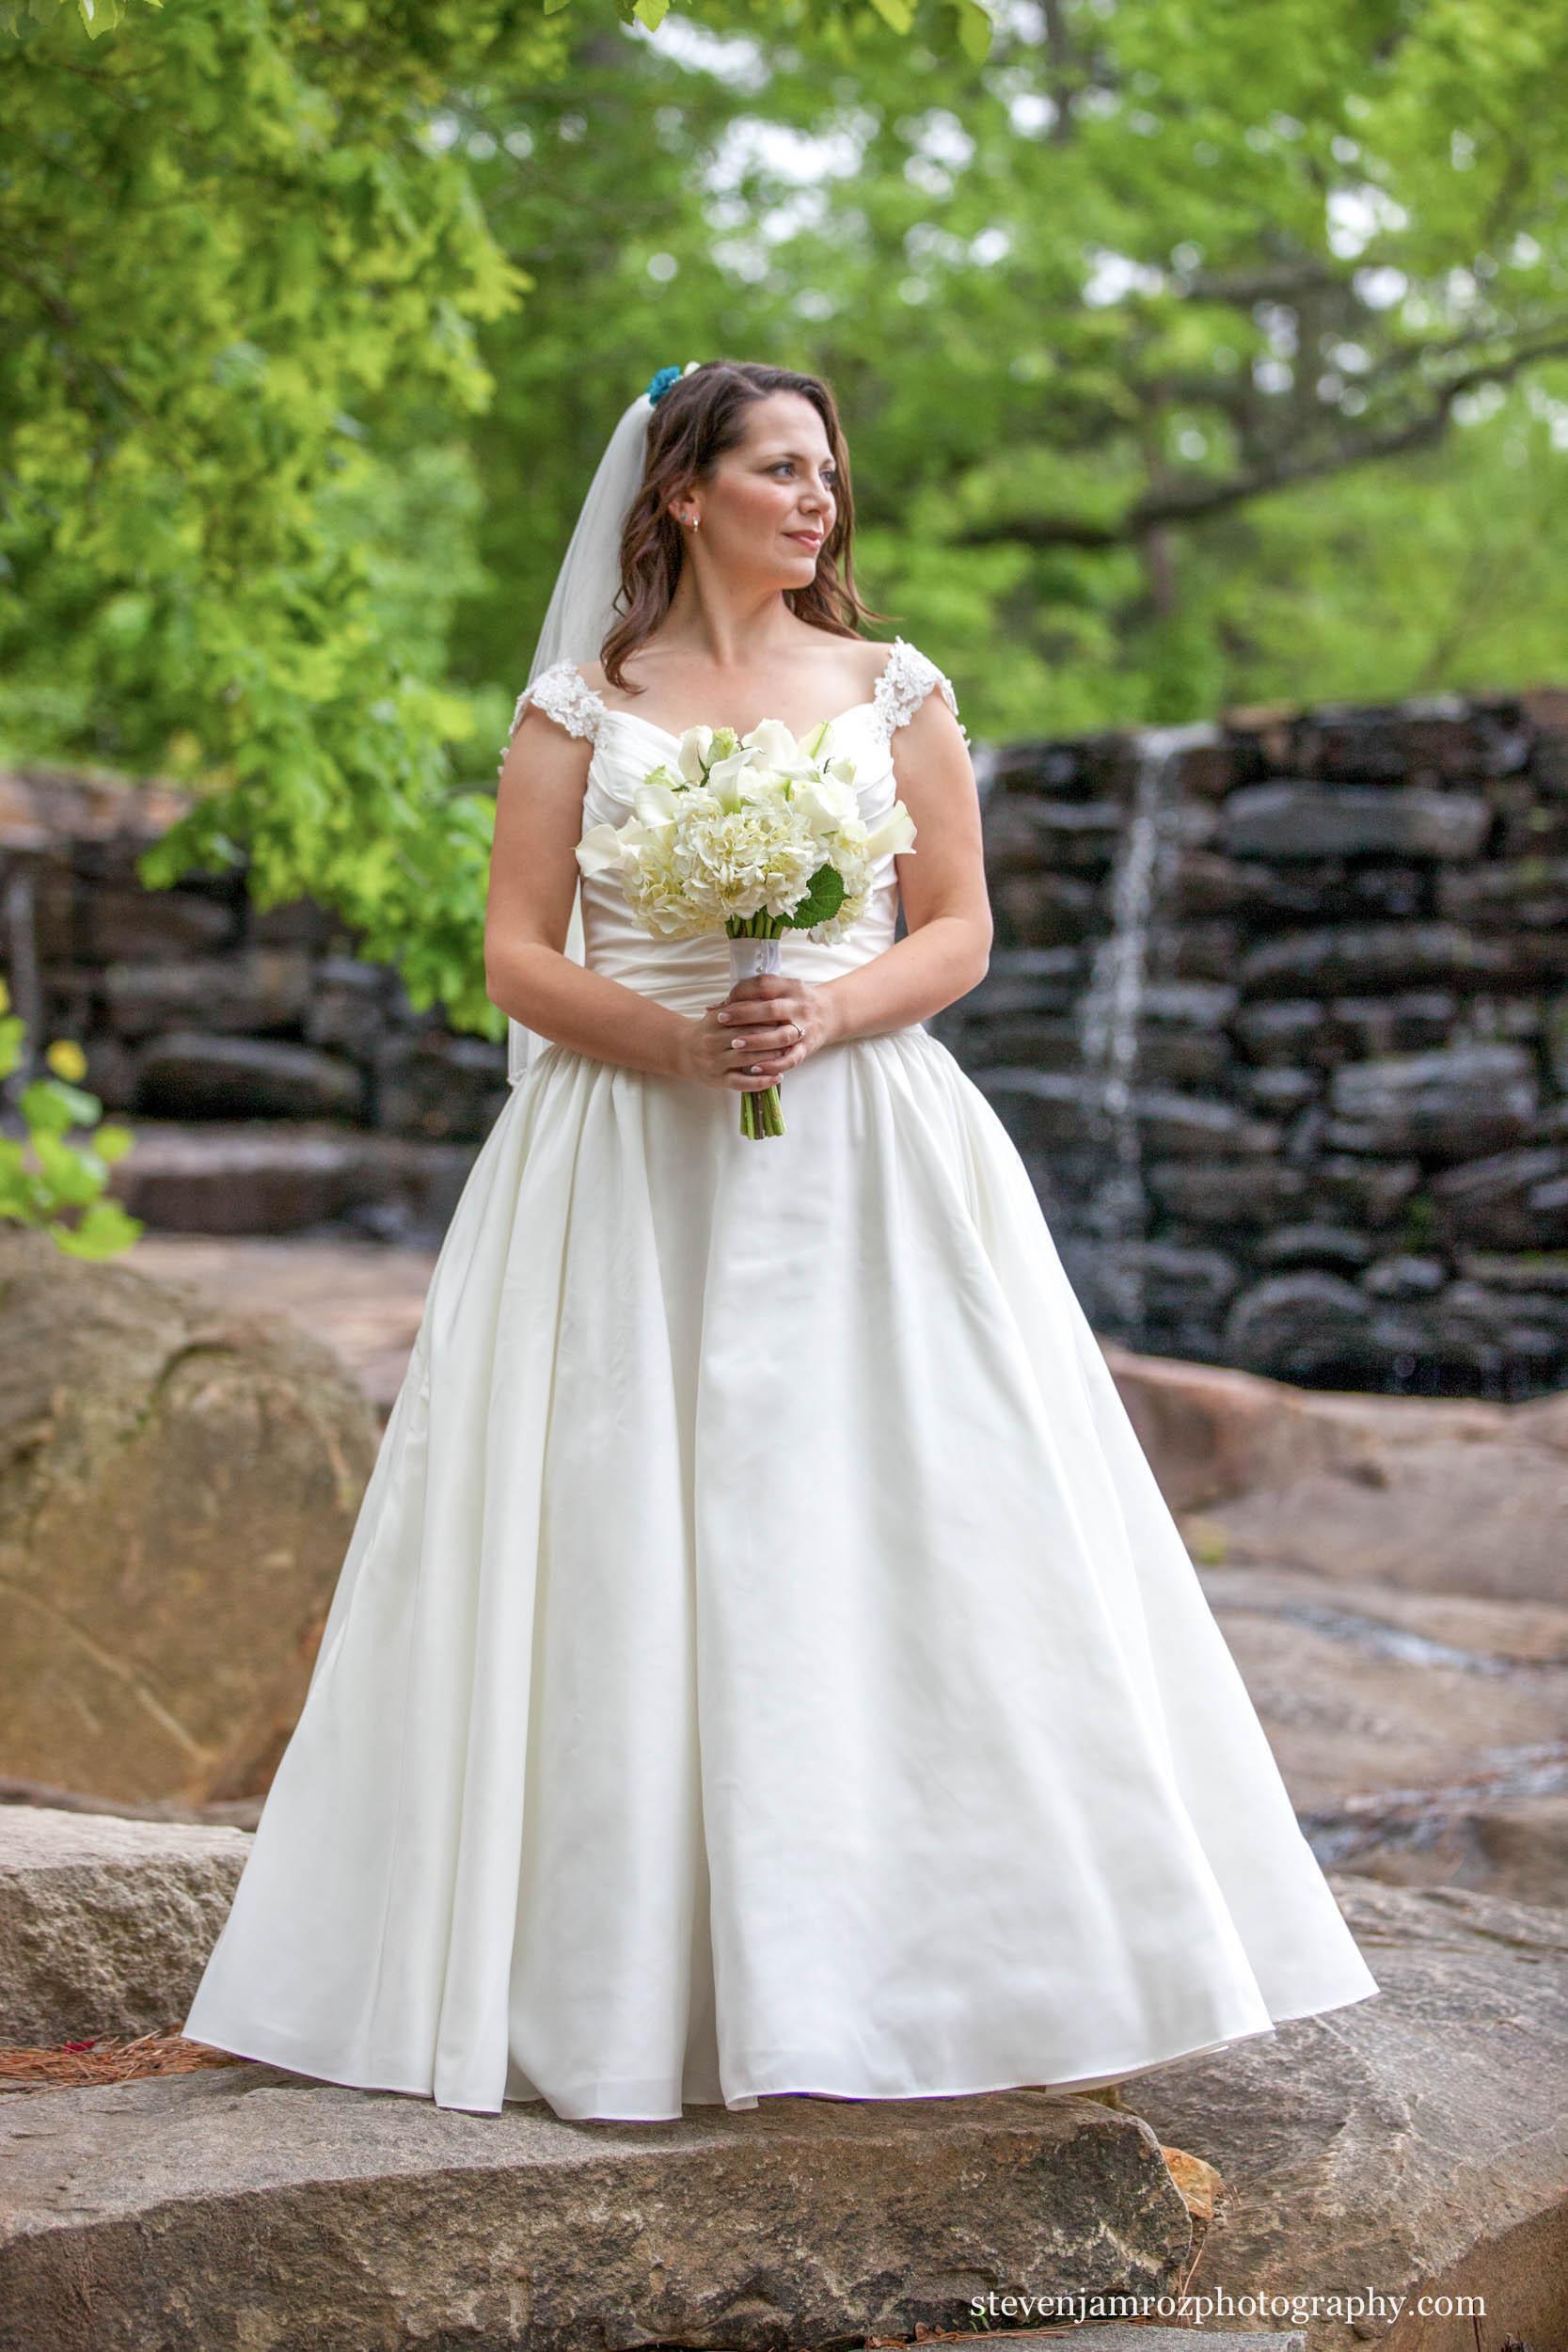 outdoor-yates-mill-bridal-photos-steven-jamroz-photography-0291.jpg